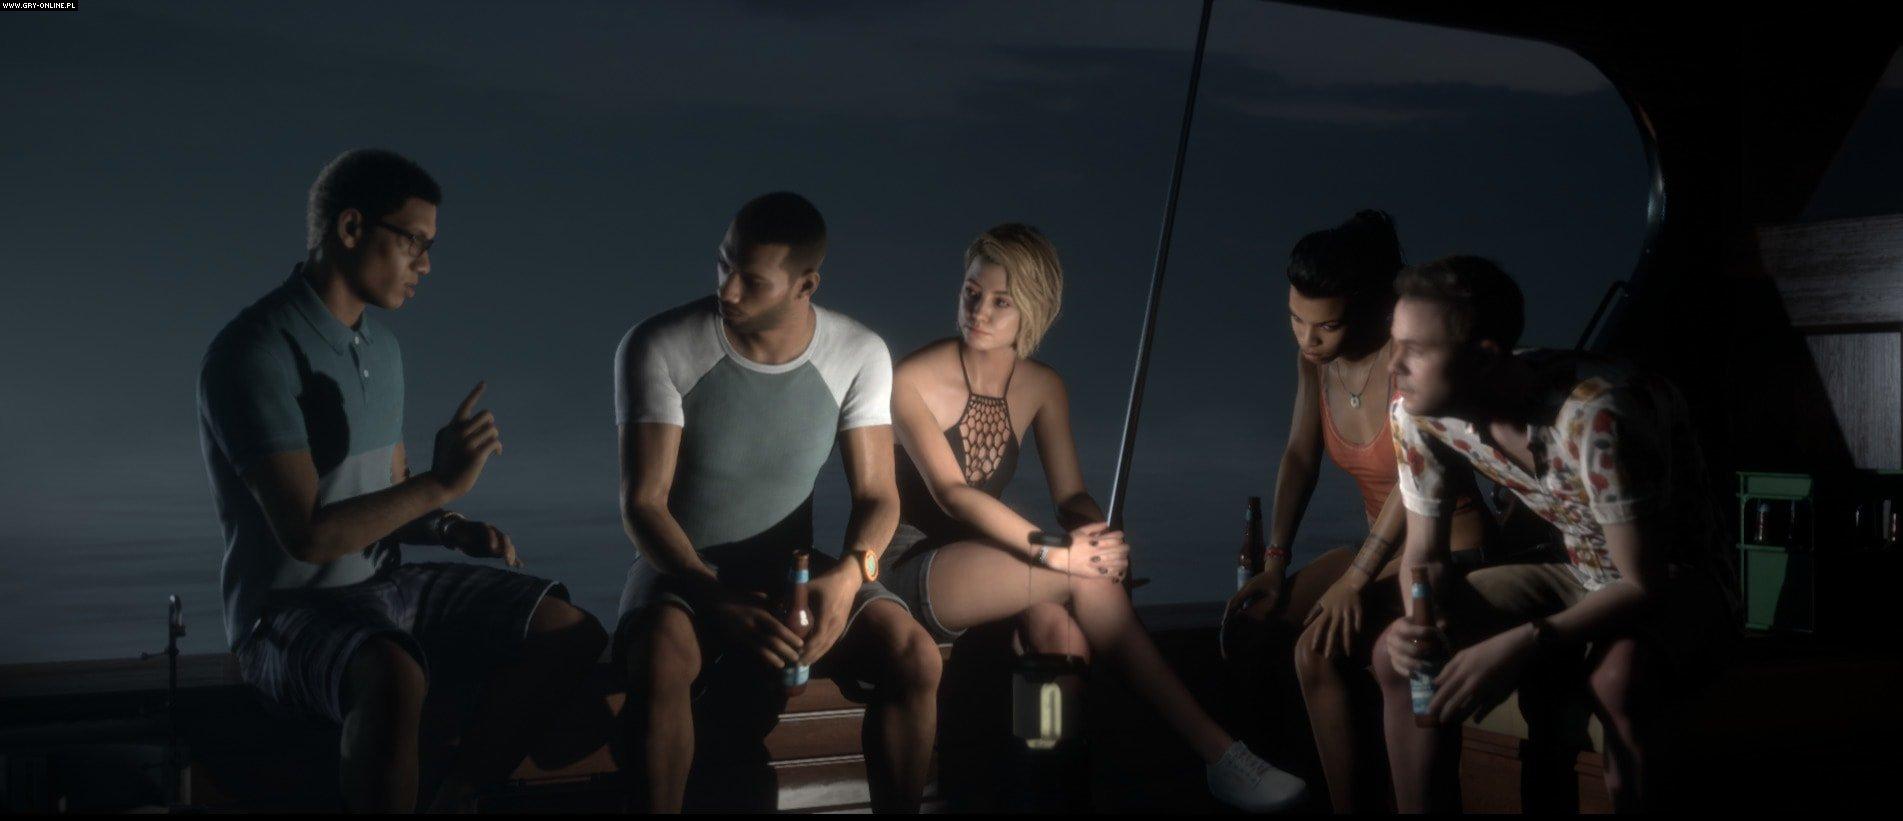 The Dark Pictures: Man of Medan PC, PS4, XONE Games Image 4/12, Supermassive Games, Bandai Namco Entertainment